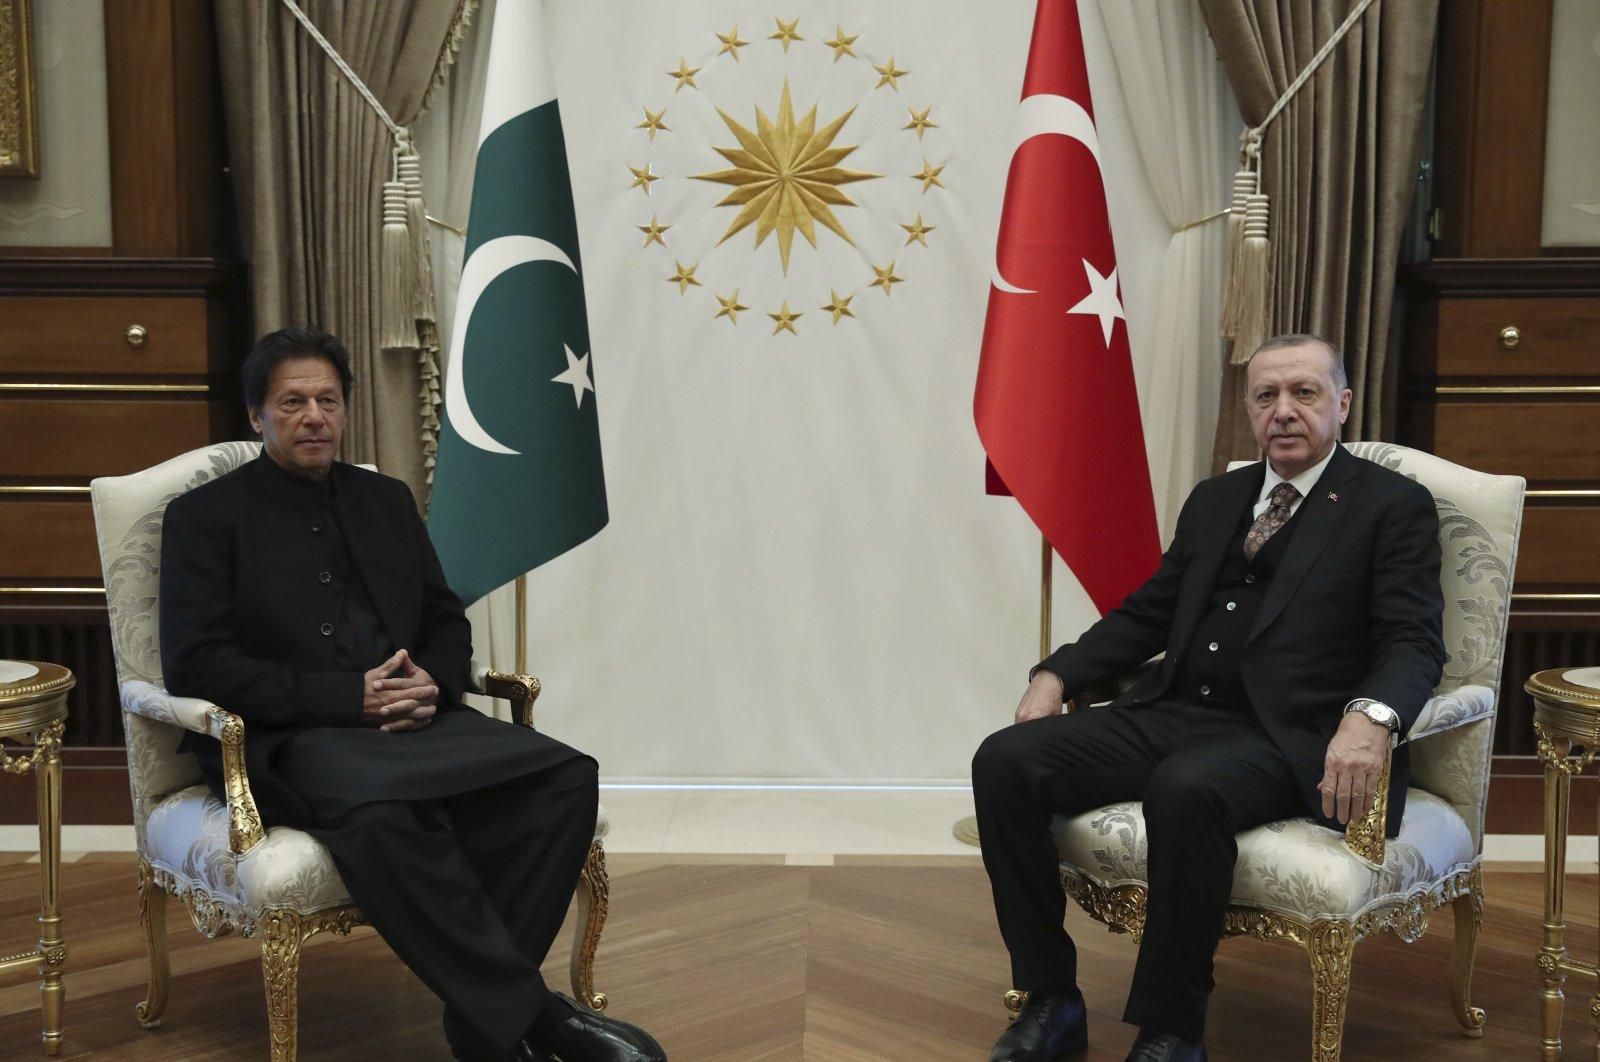 President Recep Tayyip Erdoğan (R) and Pakistani Prime Minister Imran Khan pose for the media before a meeting in Ankara, Friday, Jan. 4, 2019. (AP Photo)